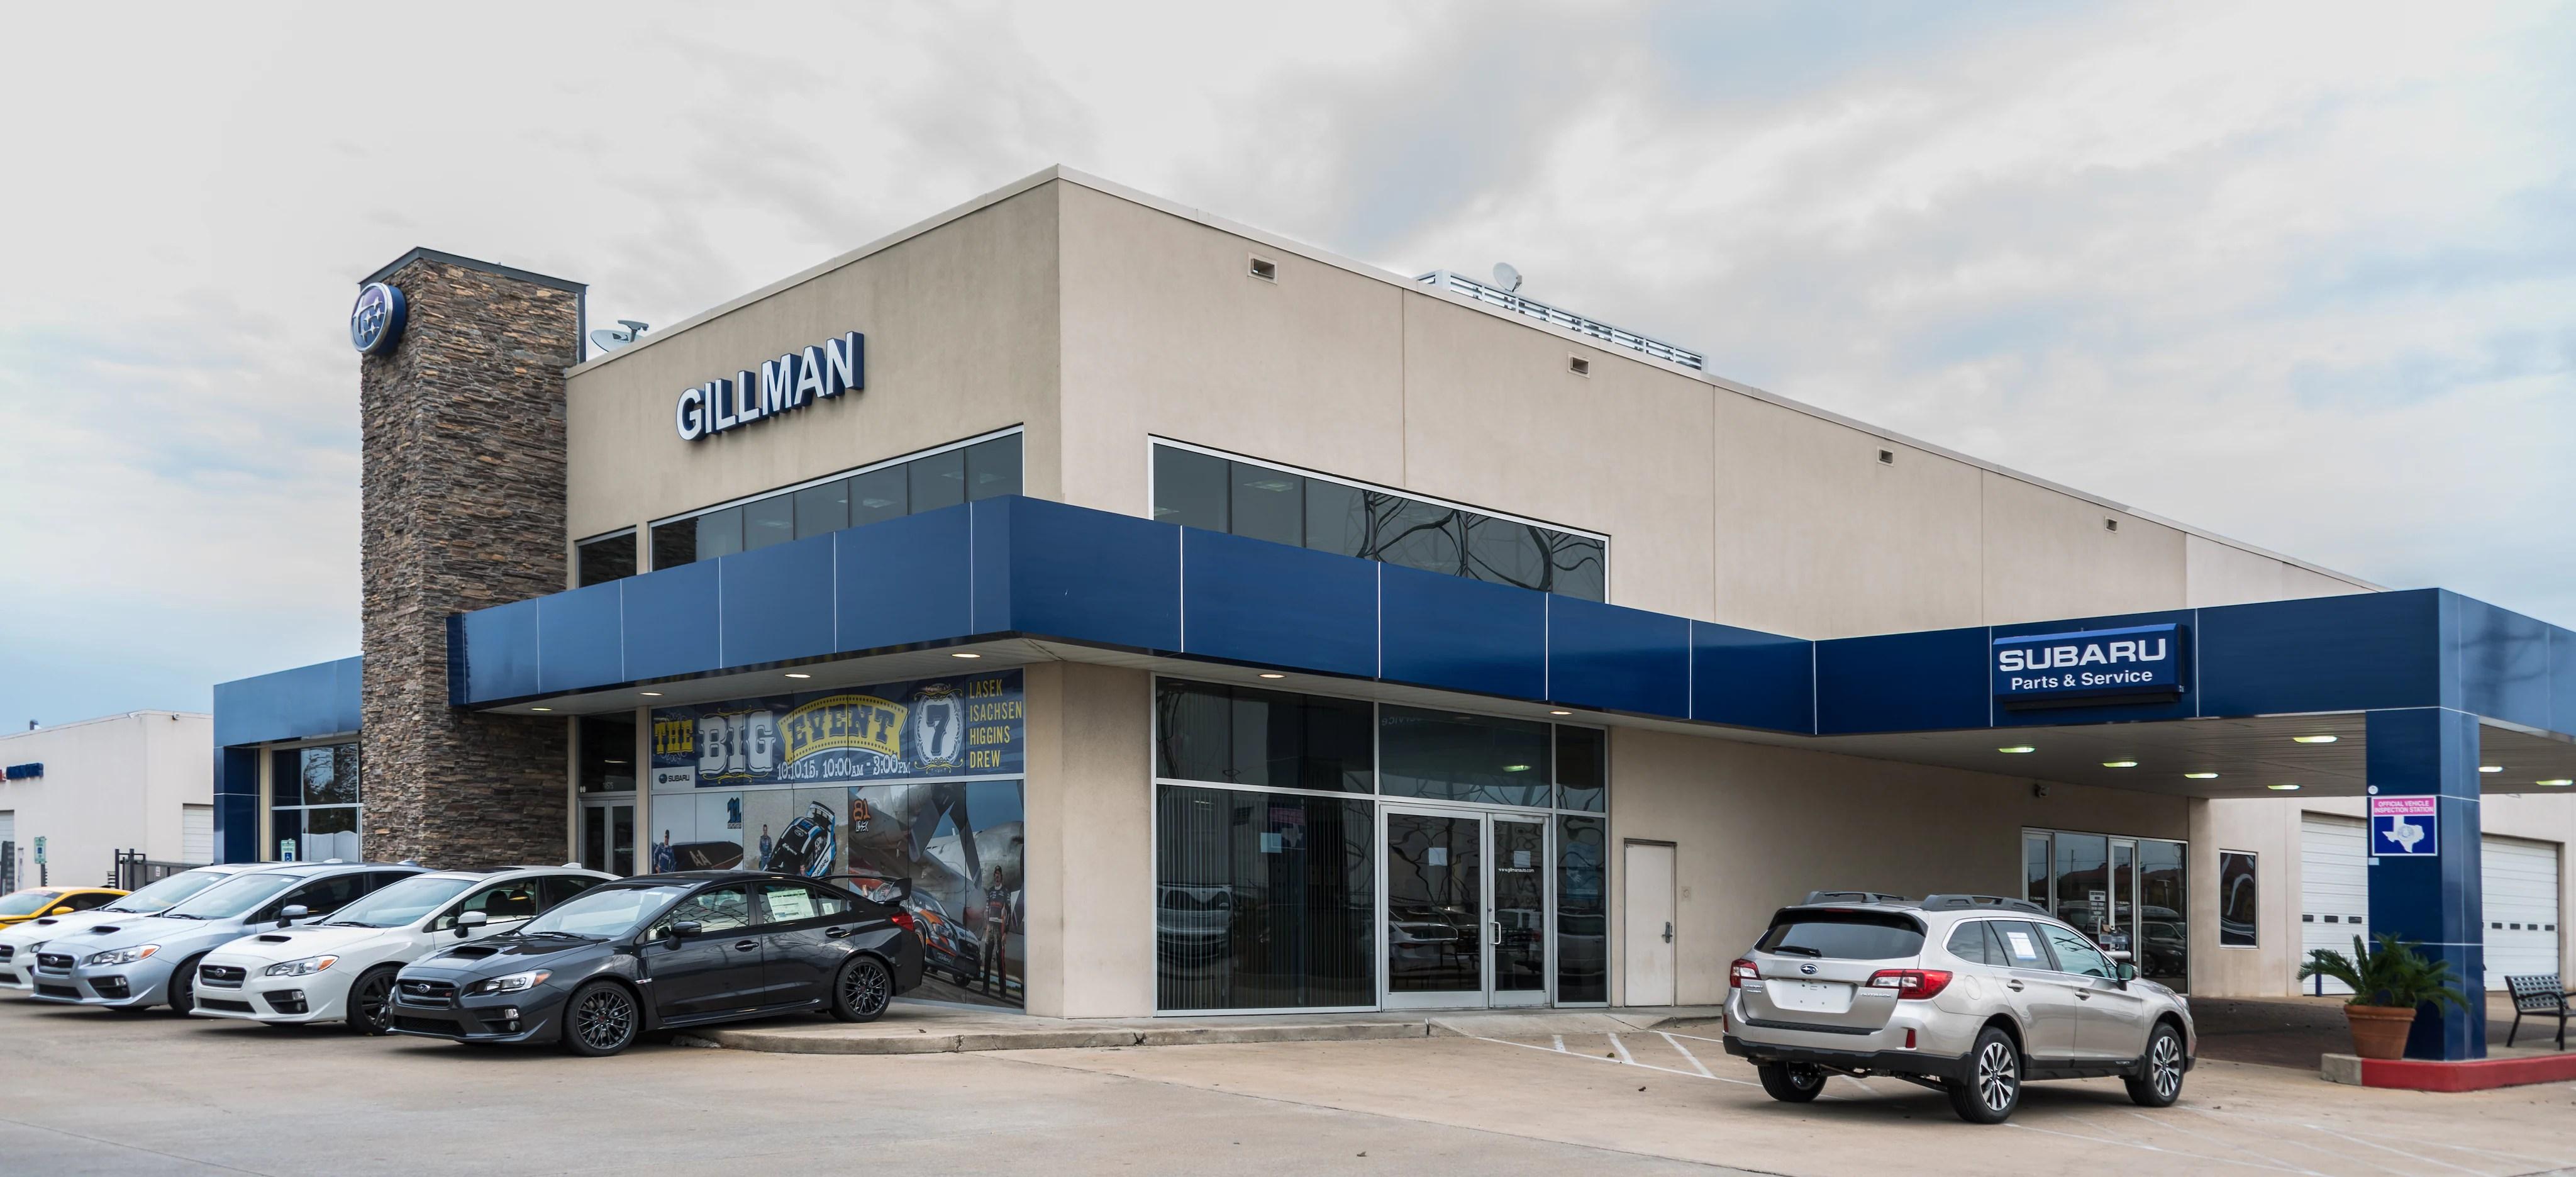 Gillman Subaru Southwest